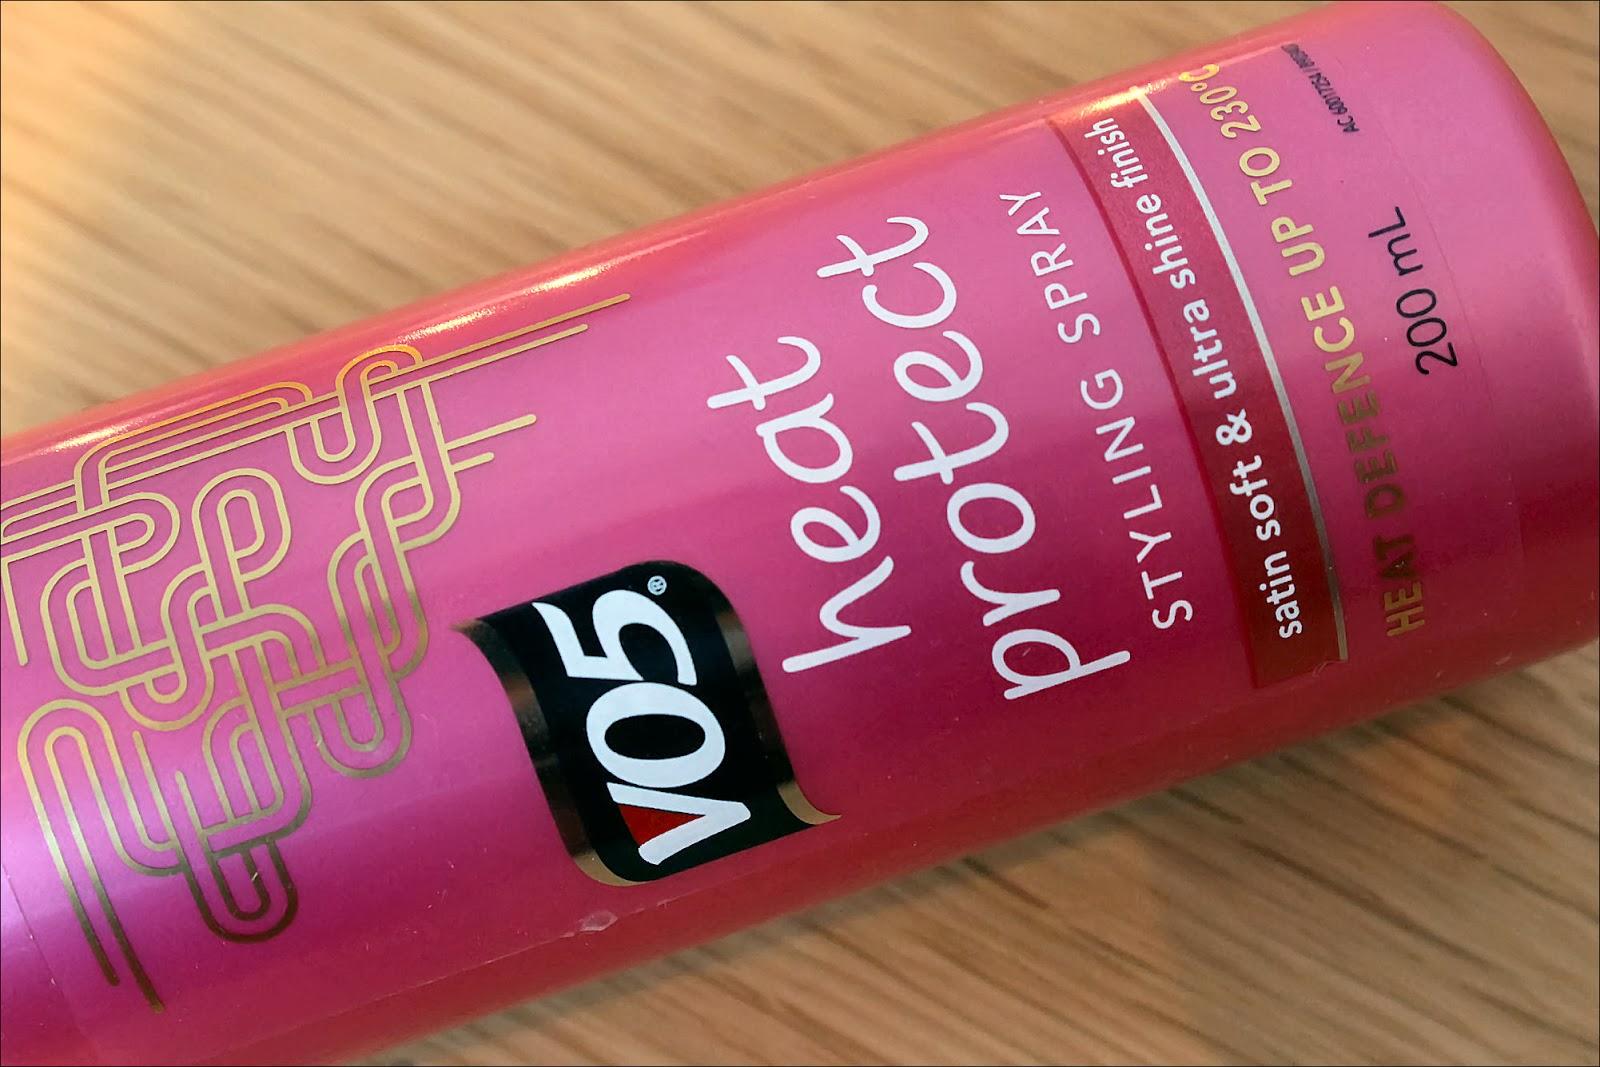 VO5 Heat Defense Styling Spray